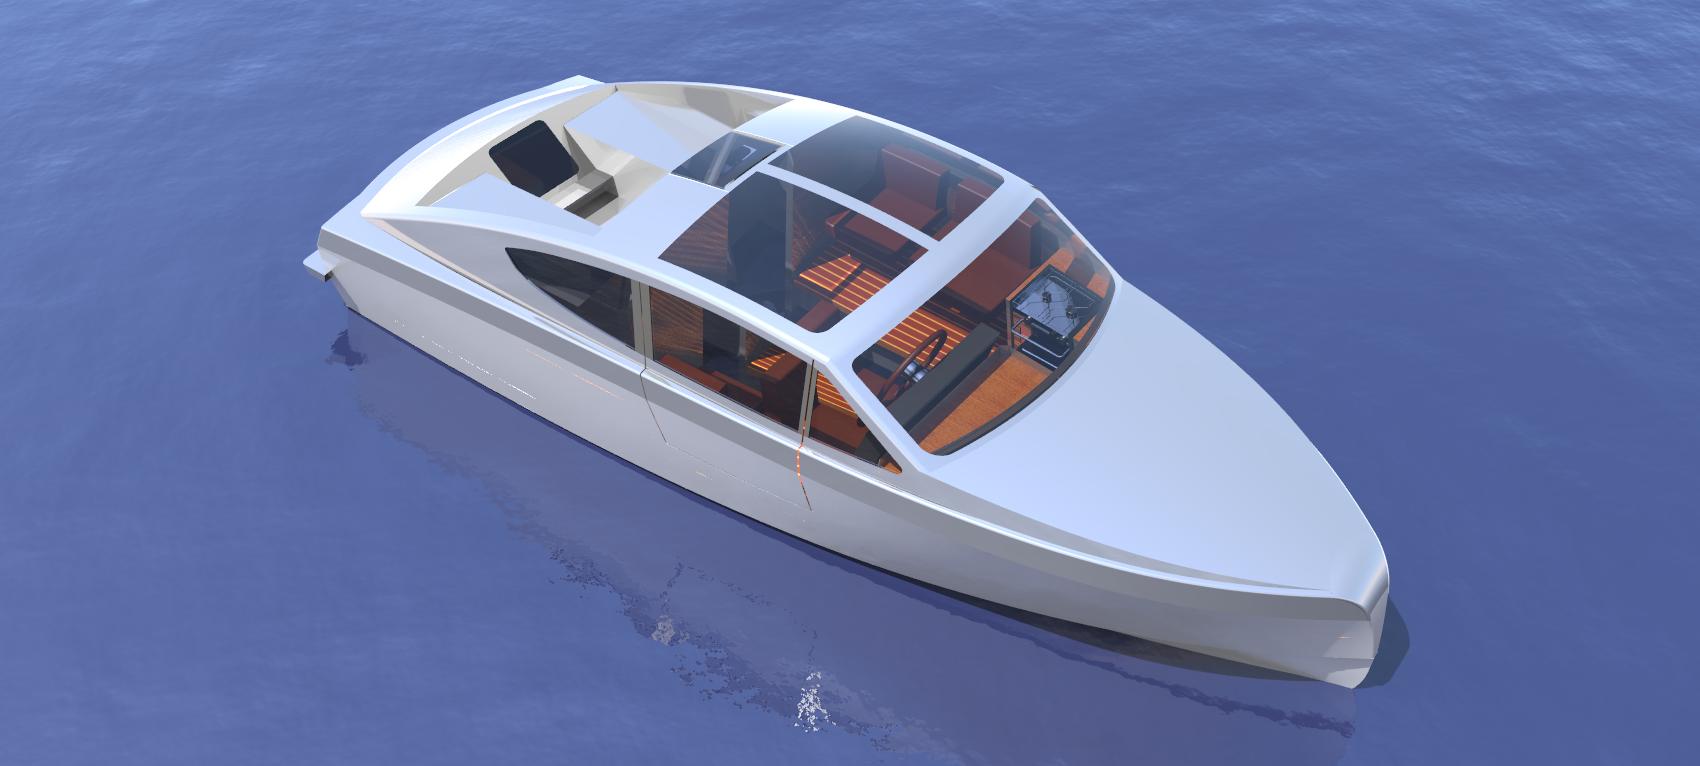 Exterior Korvet 8 Design Process Deep Water Aluminium Boat | Holland Boat